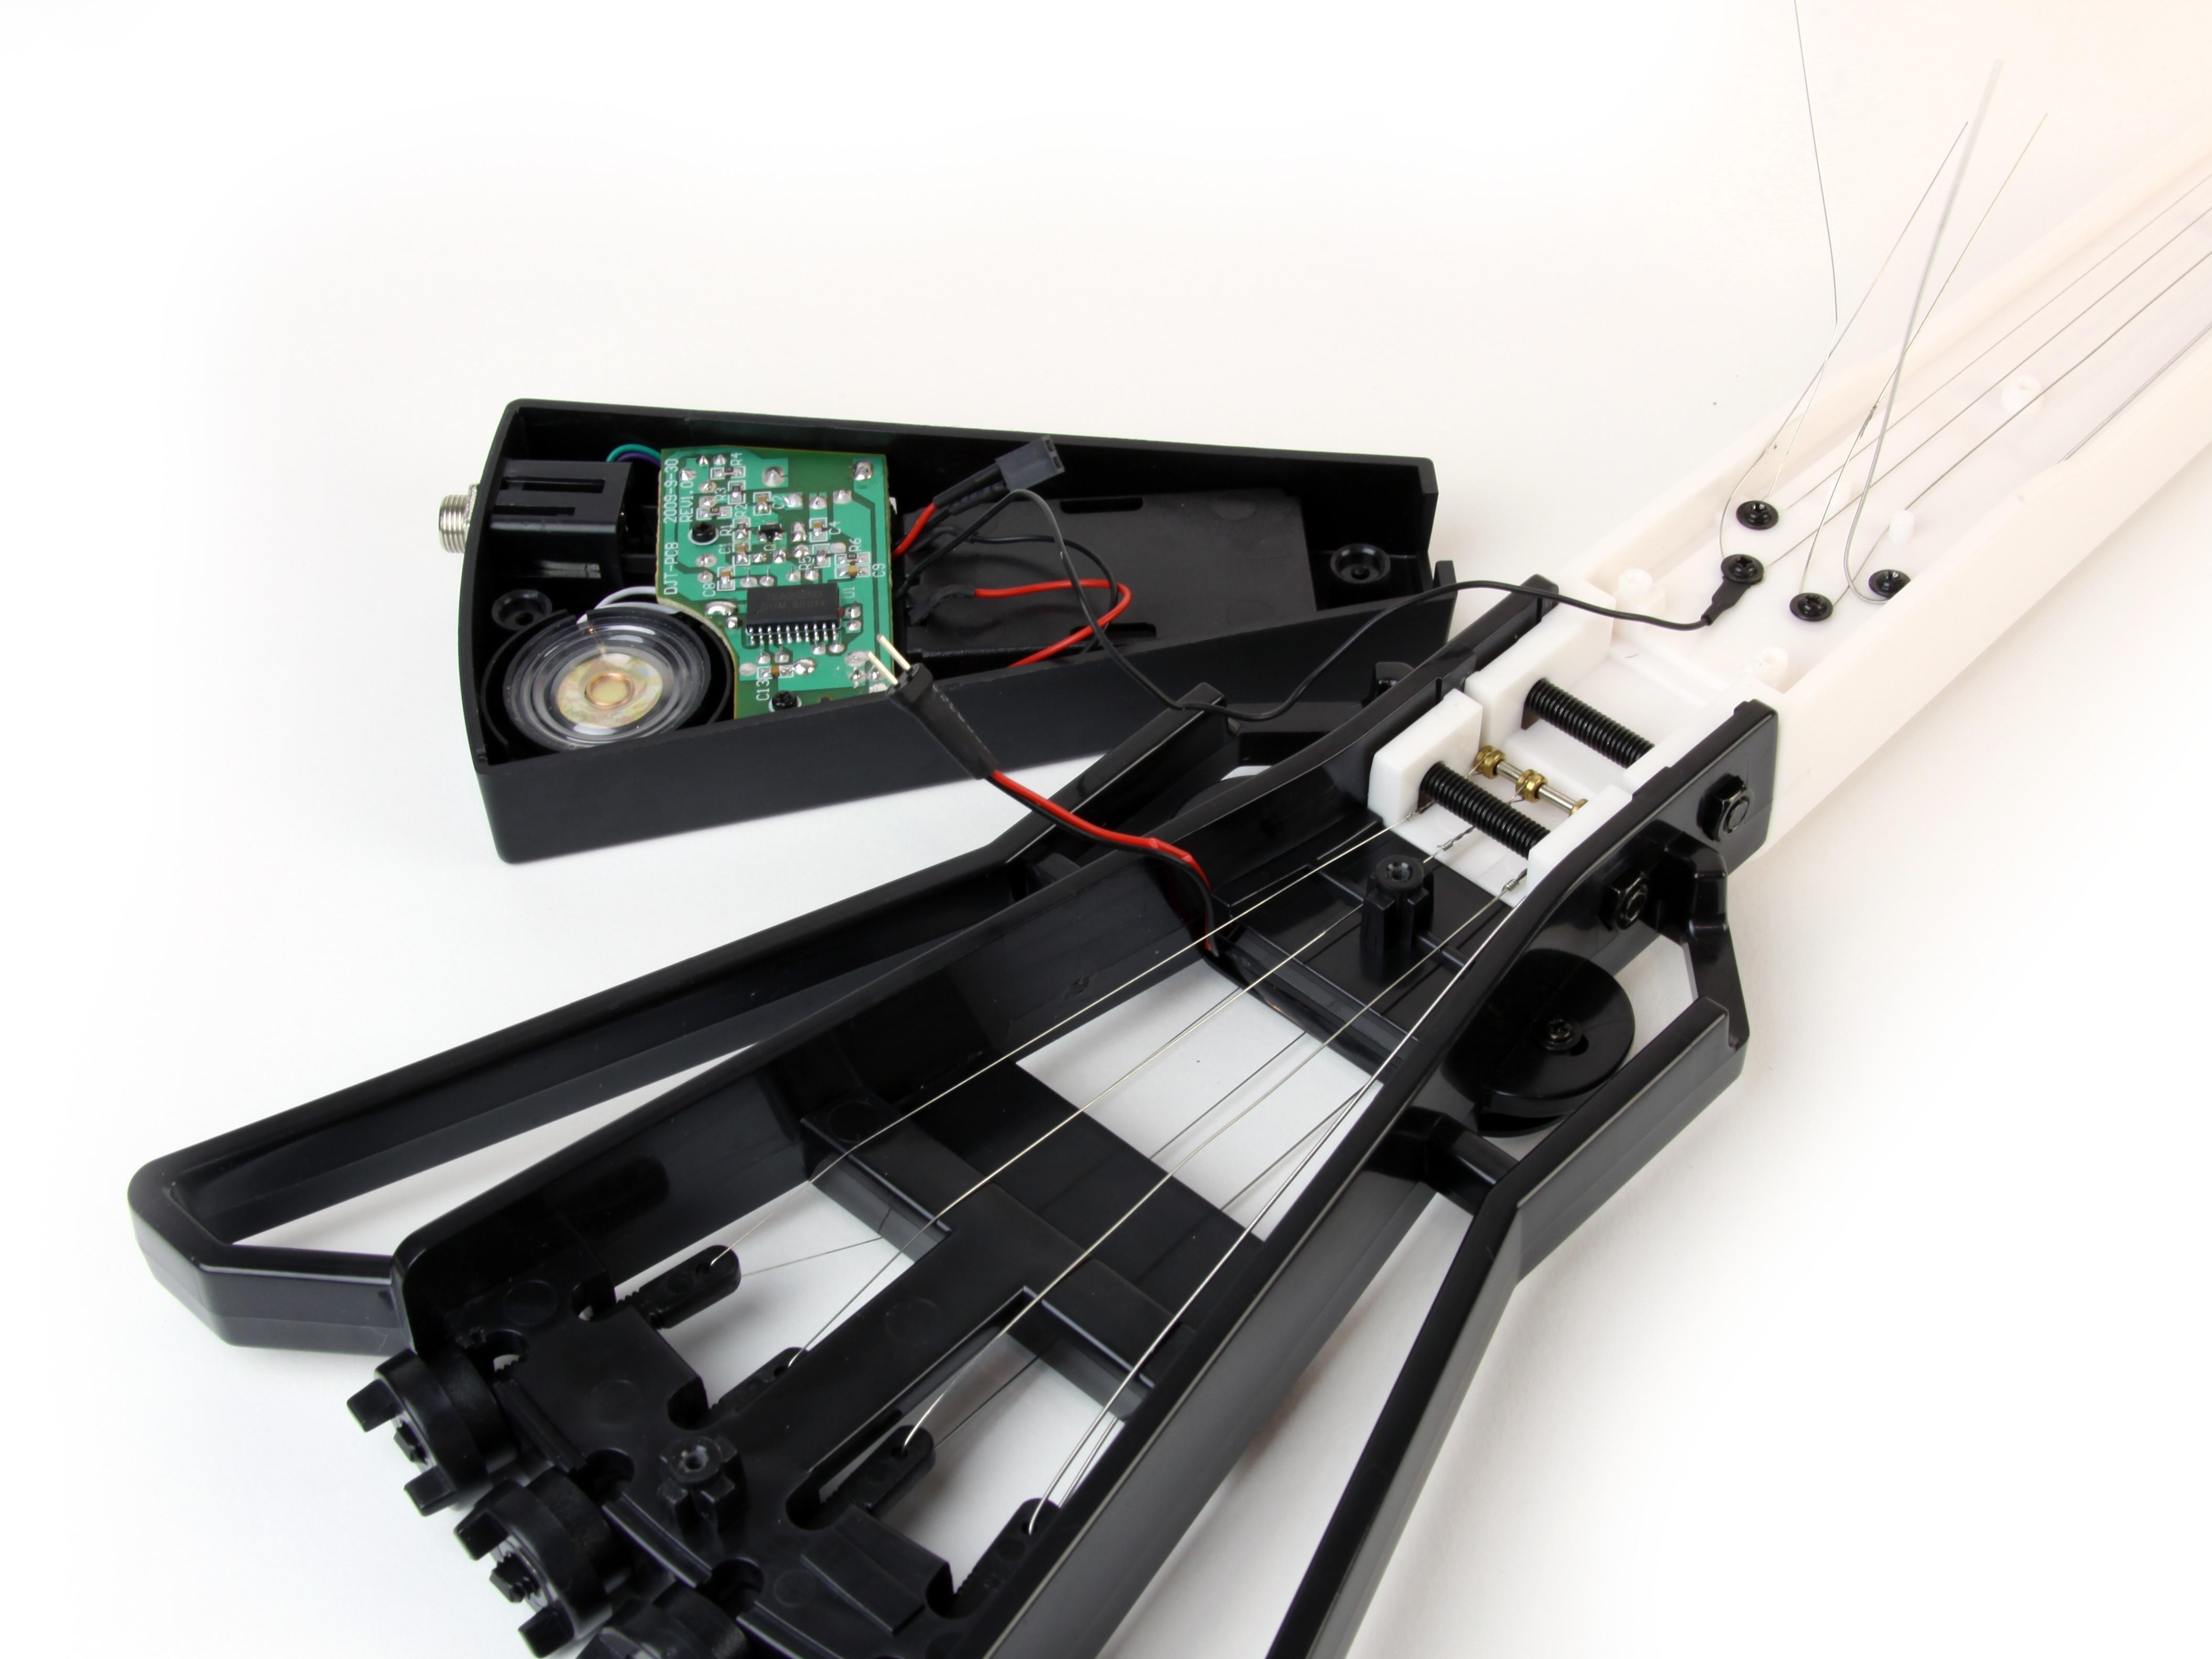 Build the Gakken MiniGuitar